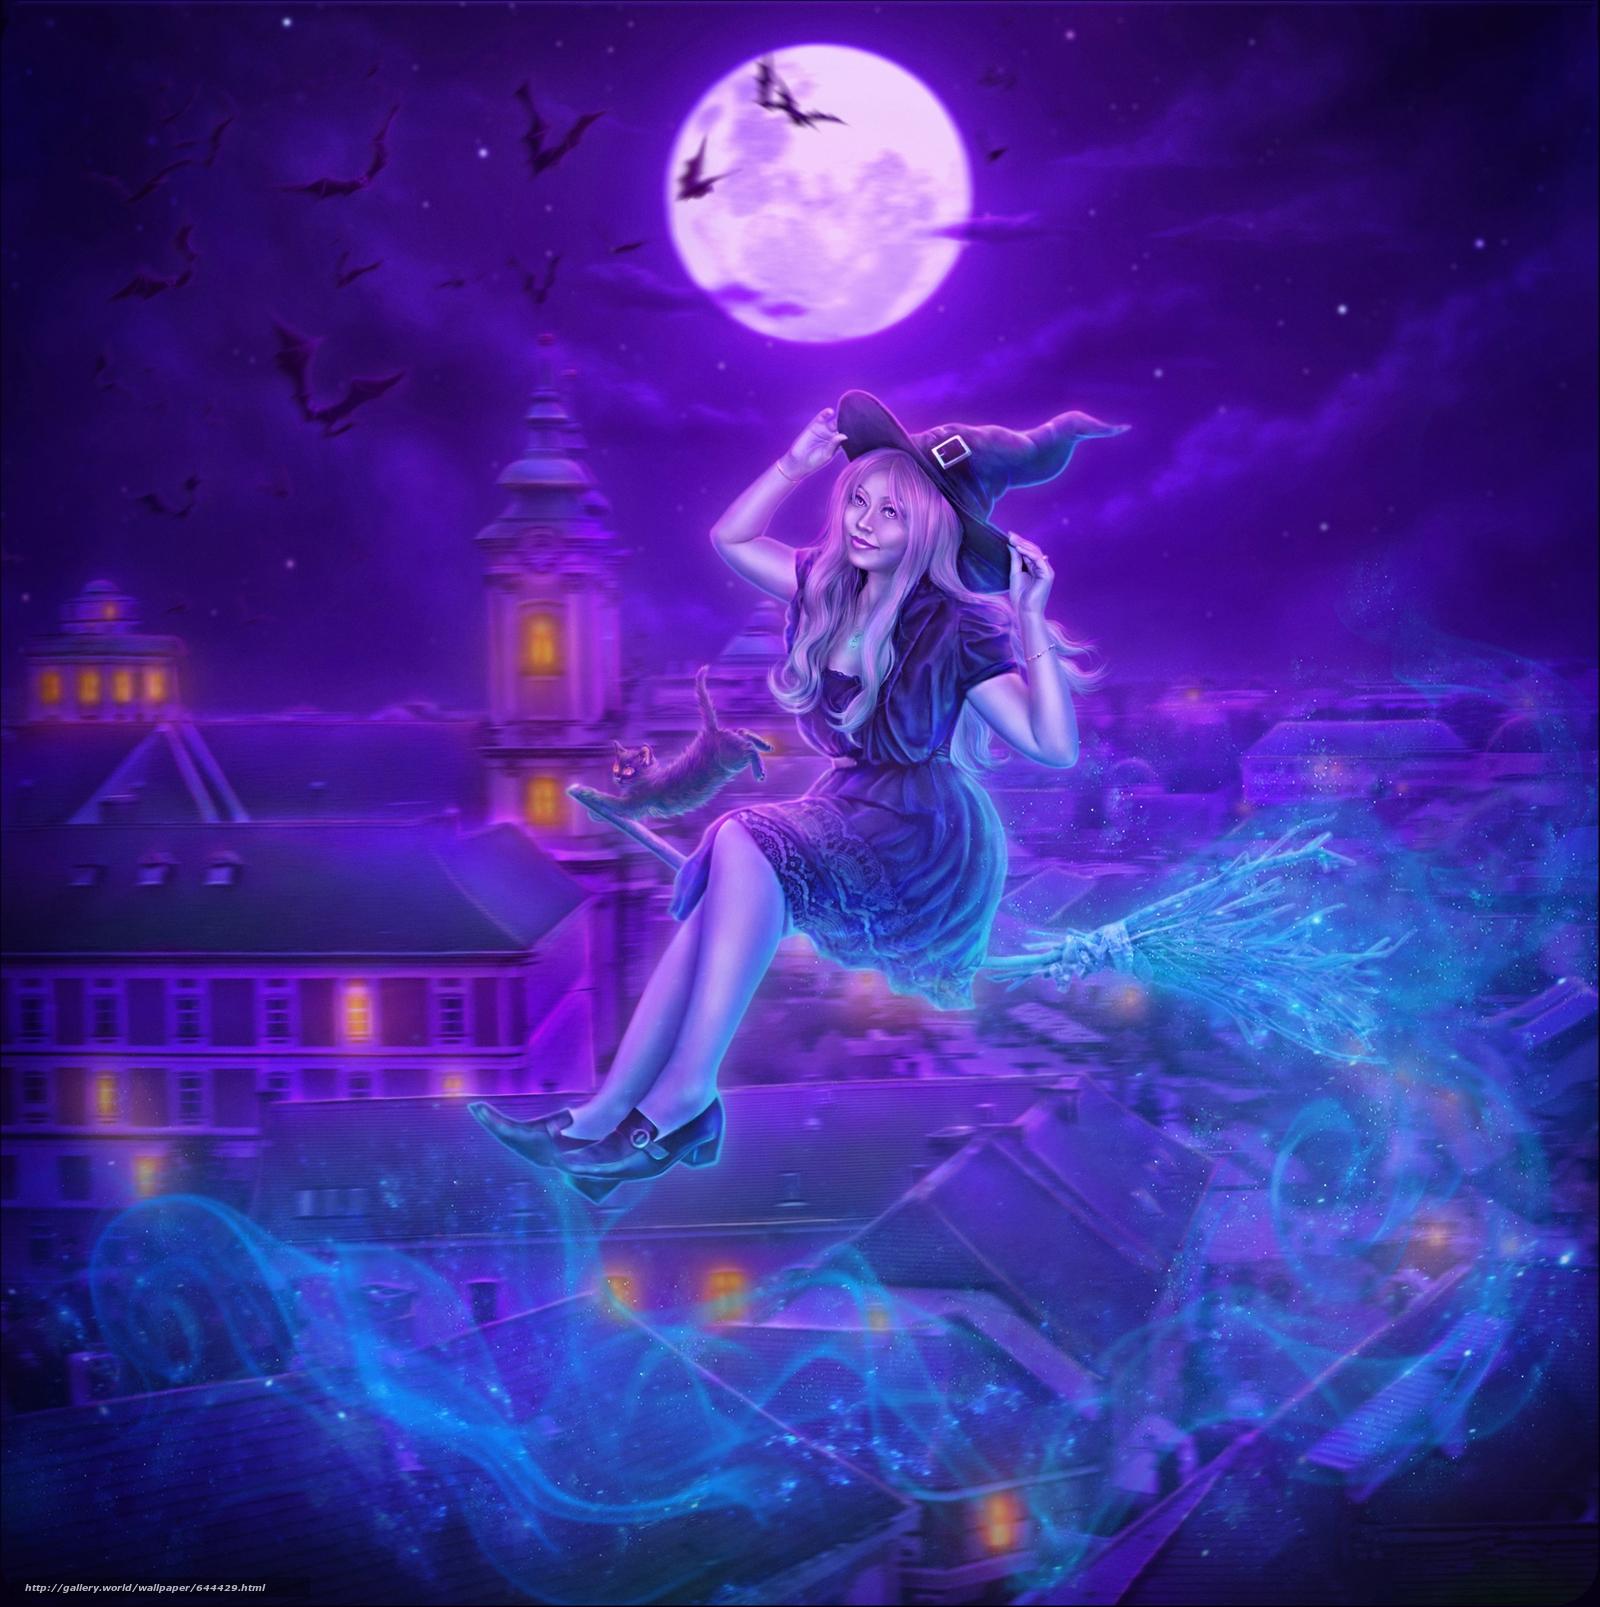 night, moon, vedmachka on a broomstick, kitten, fantasy